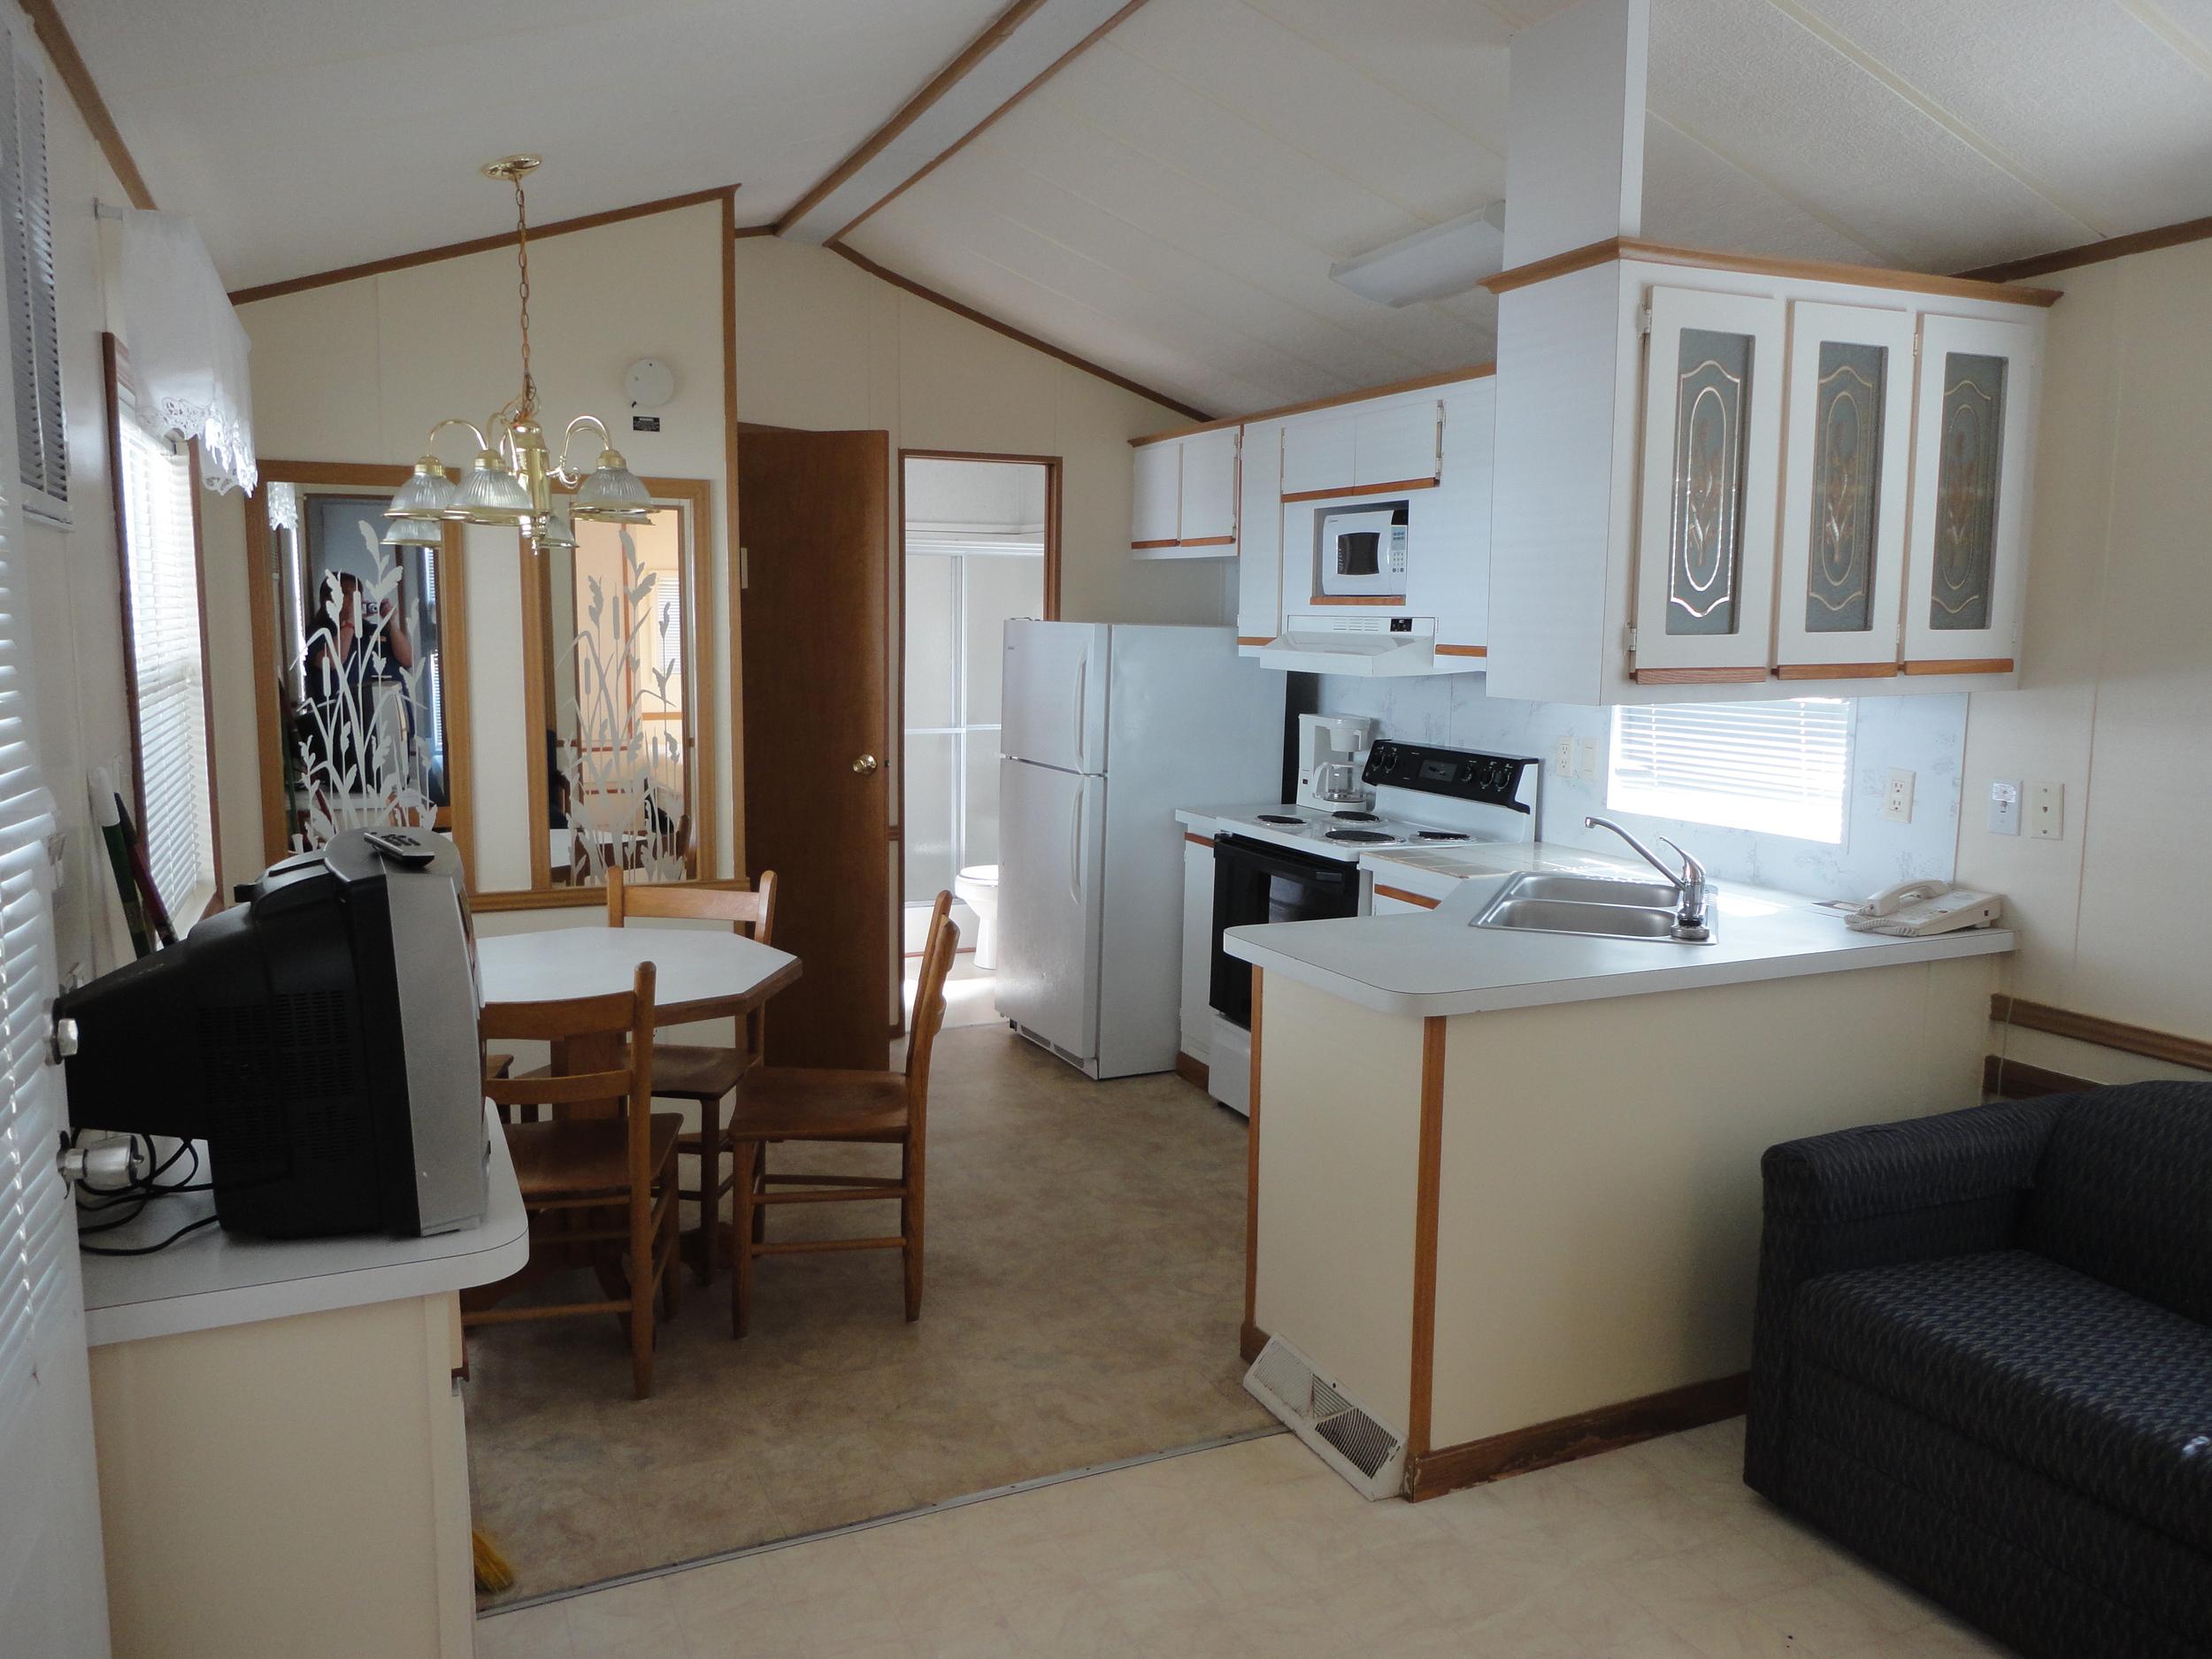 Vacation Rentals Pirateland Family Camping Resort